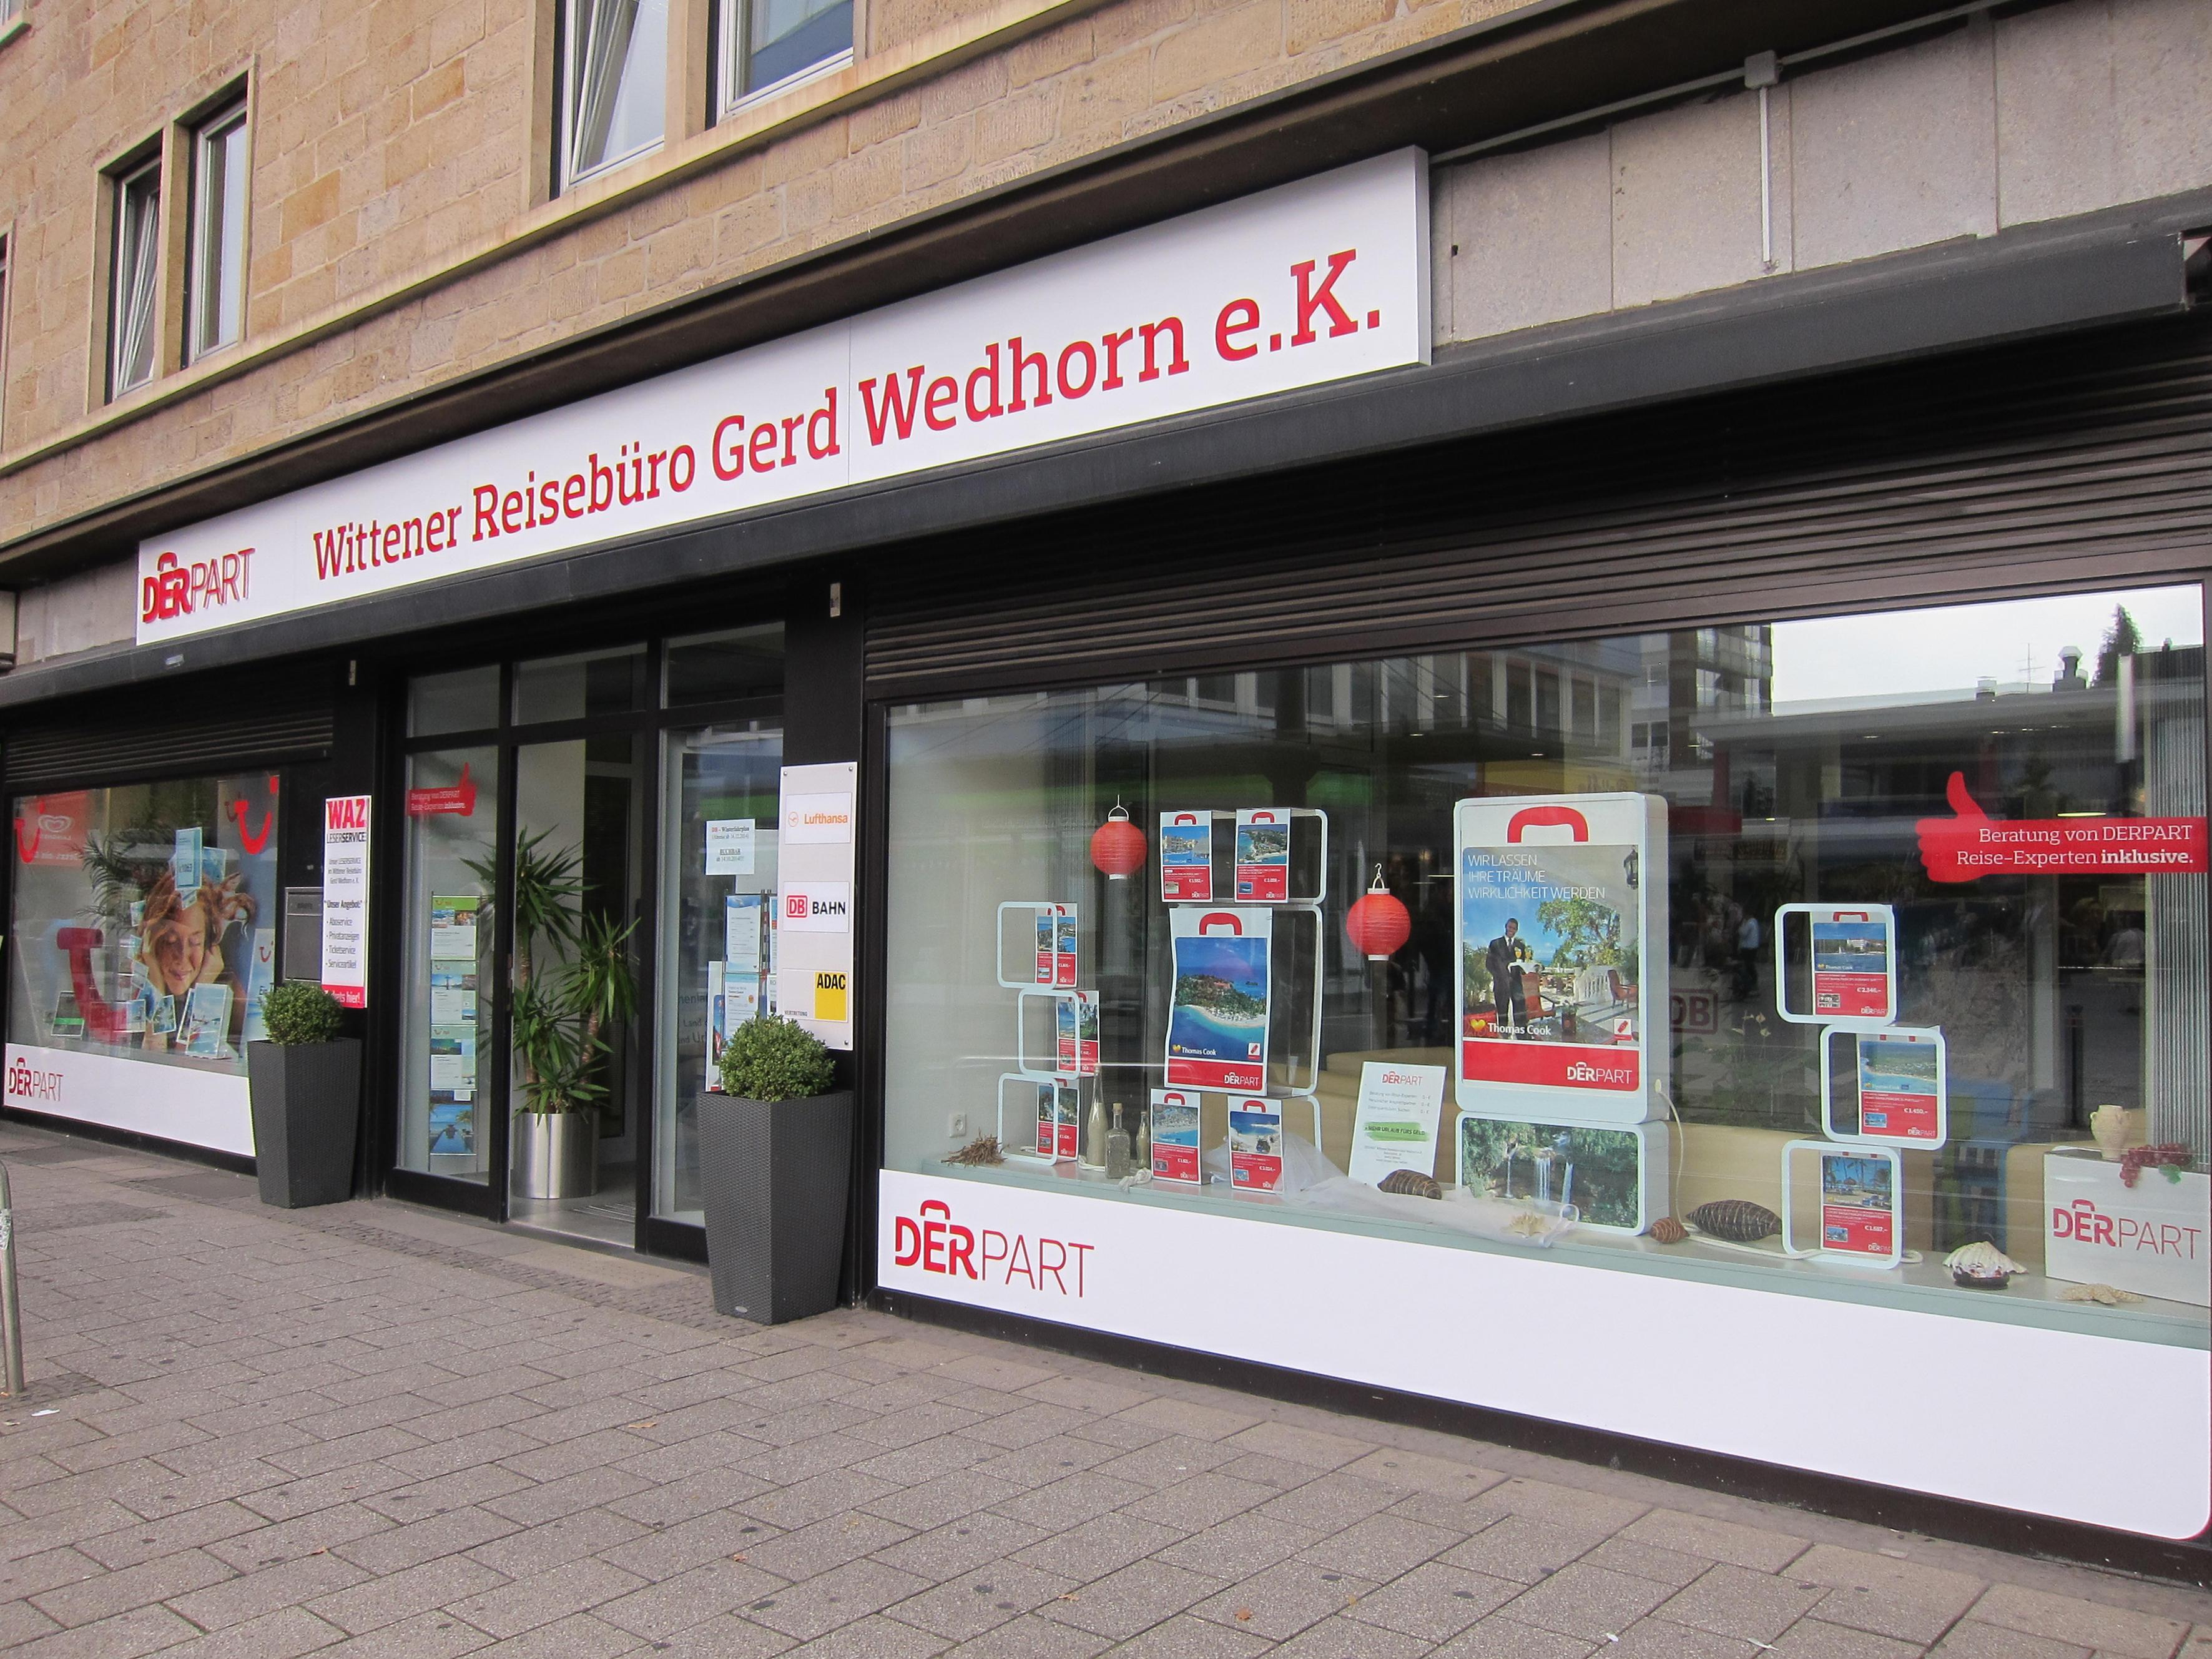 Wittener Reisebüro Gerd Wedhorn e.K.